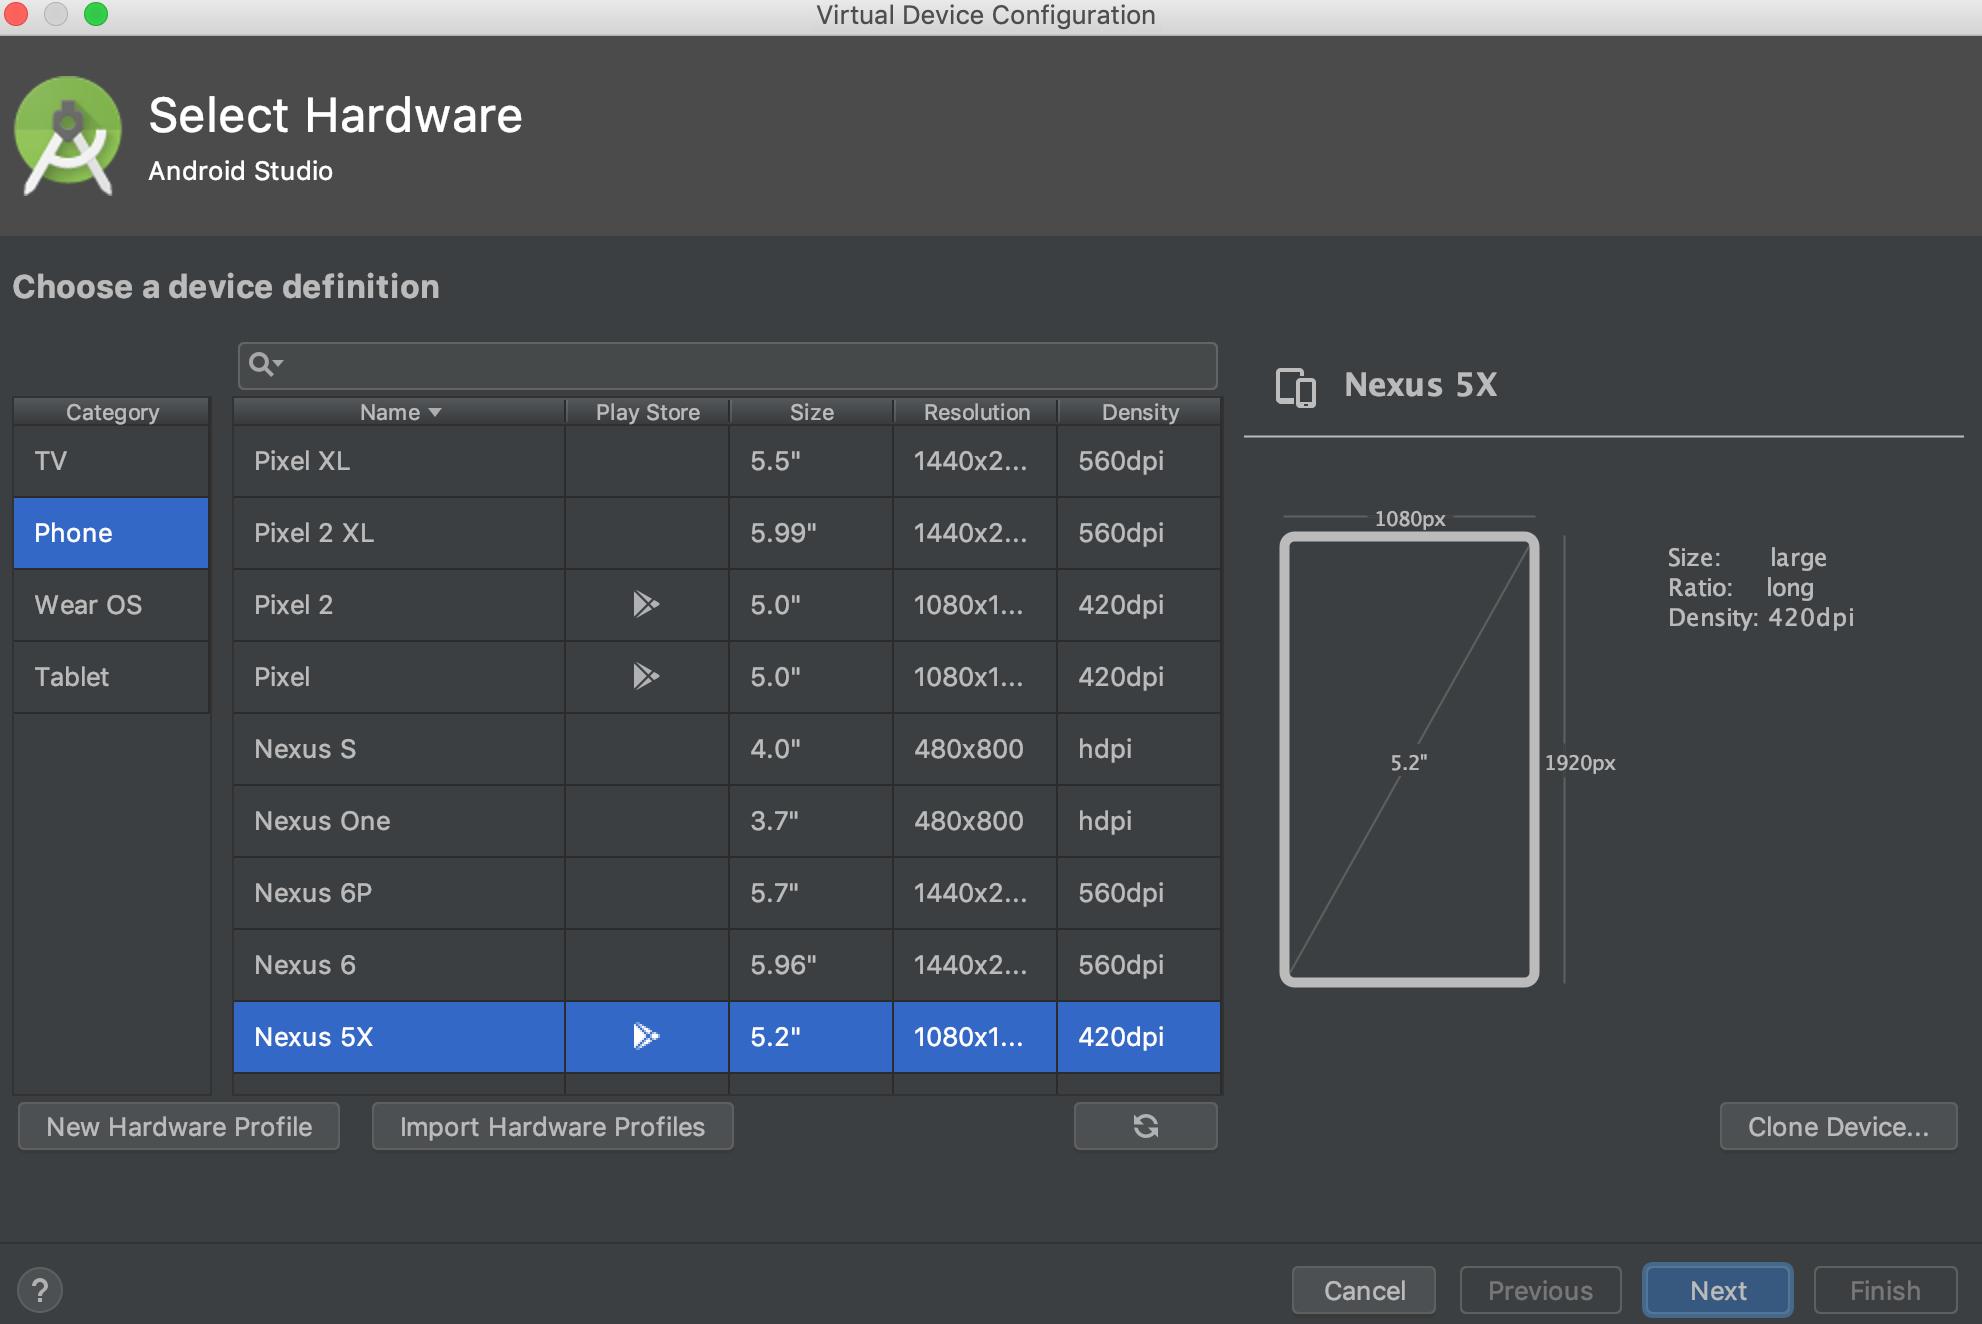 Select Hardware screen